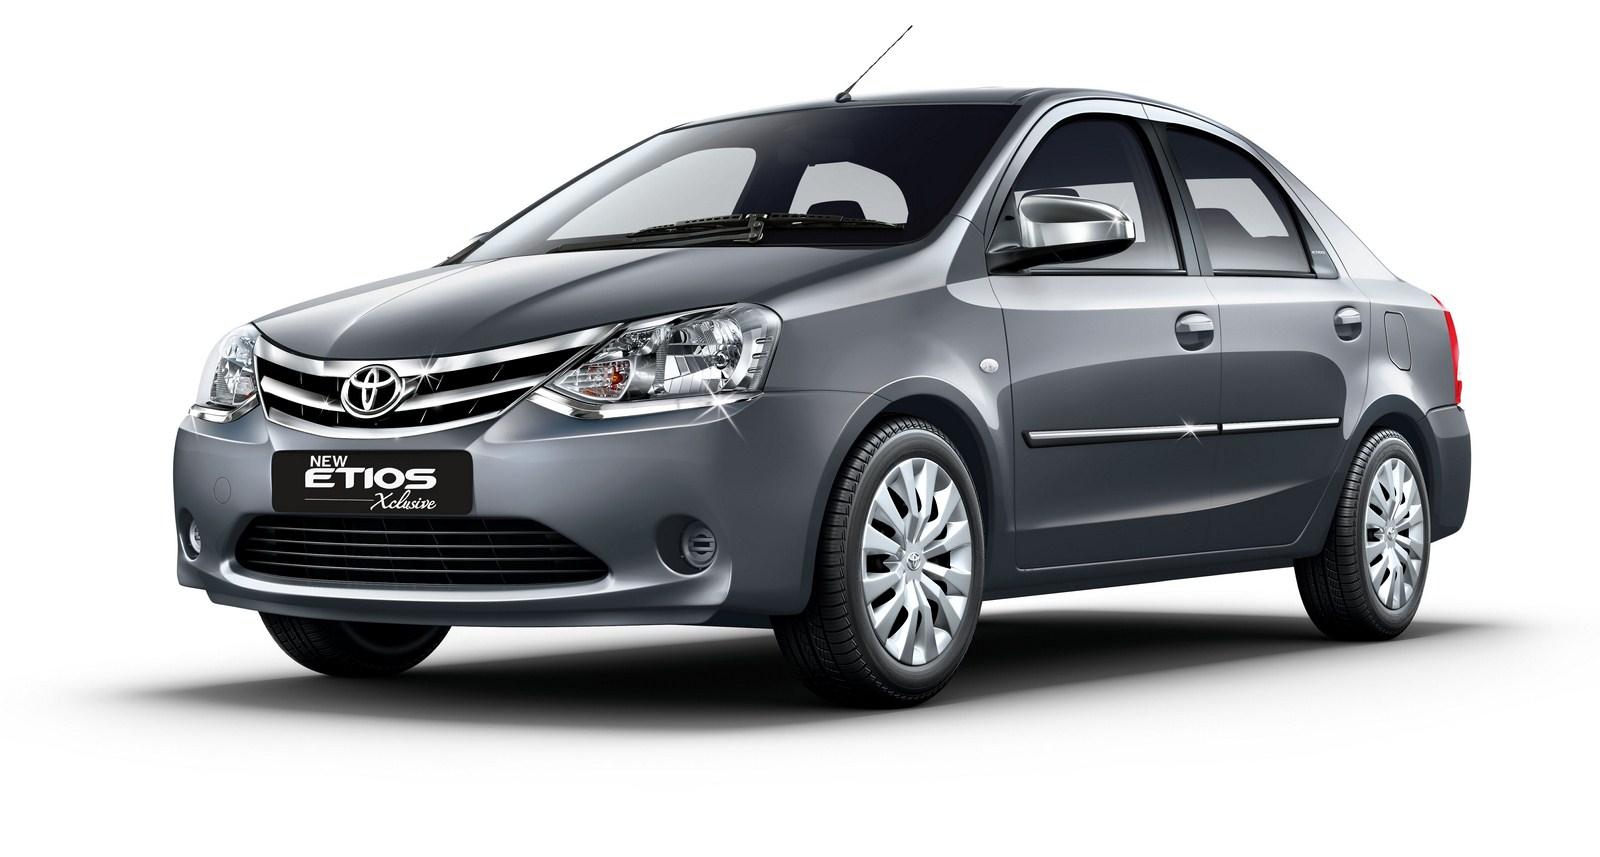 Toyota Etios Xclusive - Limited Edition